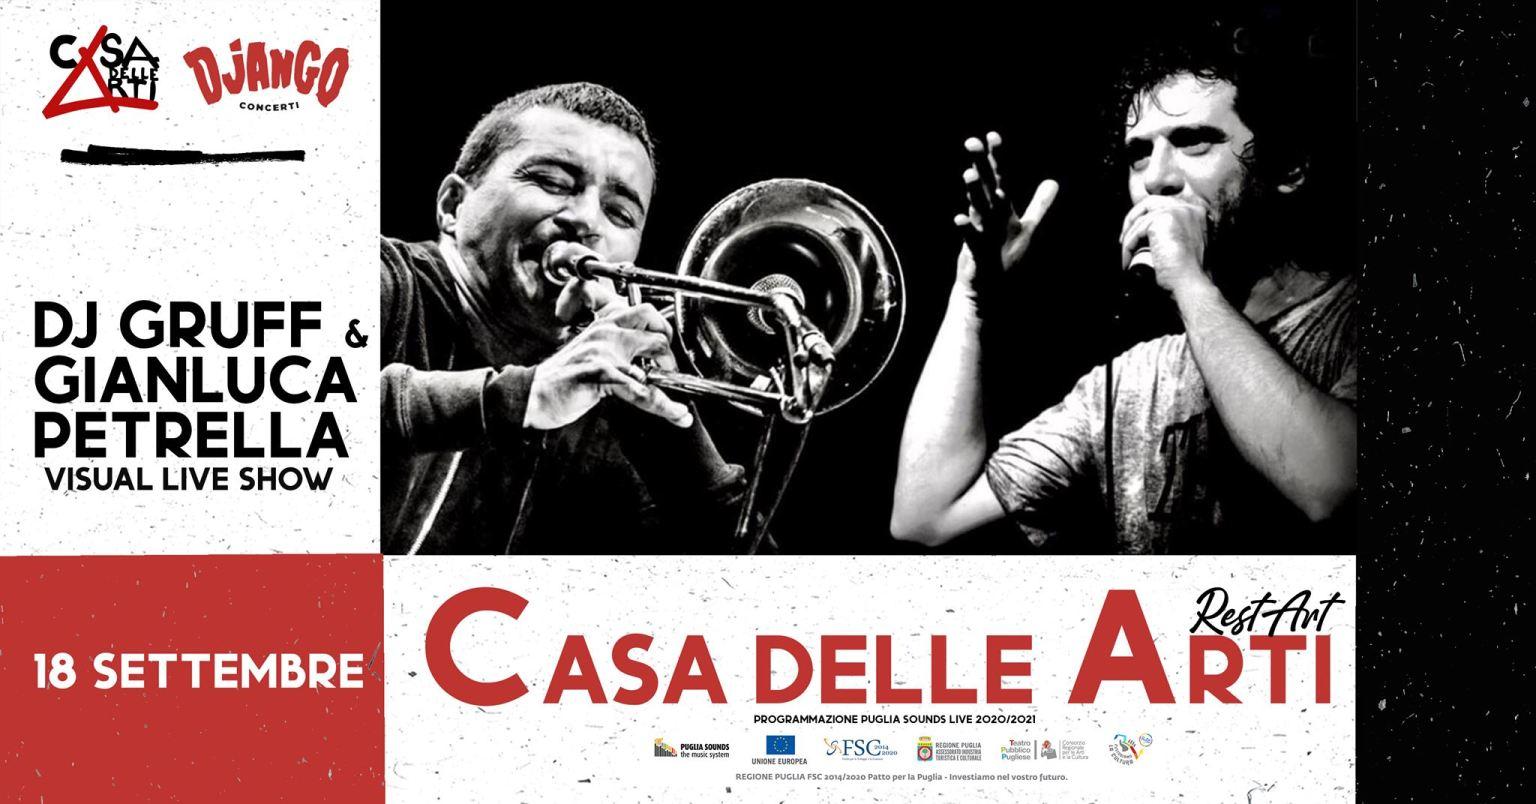 Dj Gruff & Gianluca Petrella // RestART @Casa delle Arti